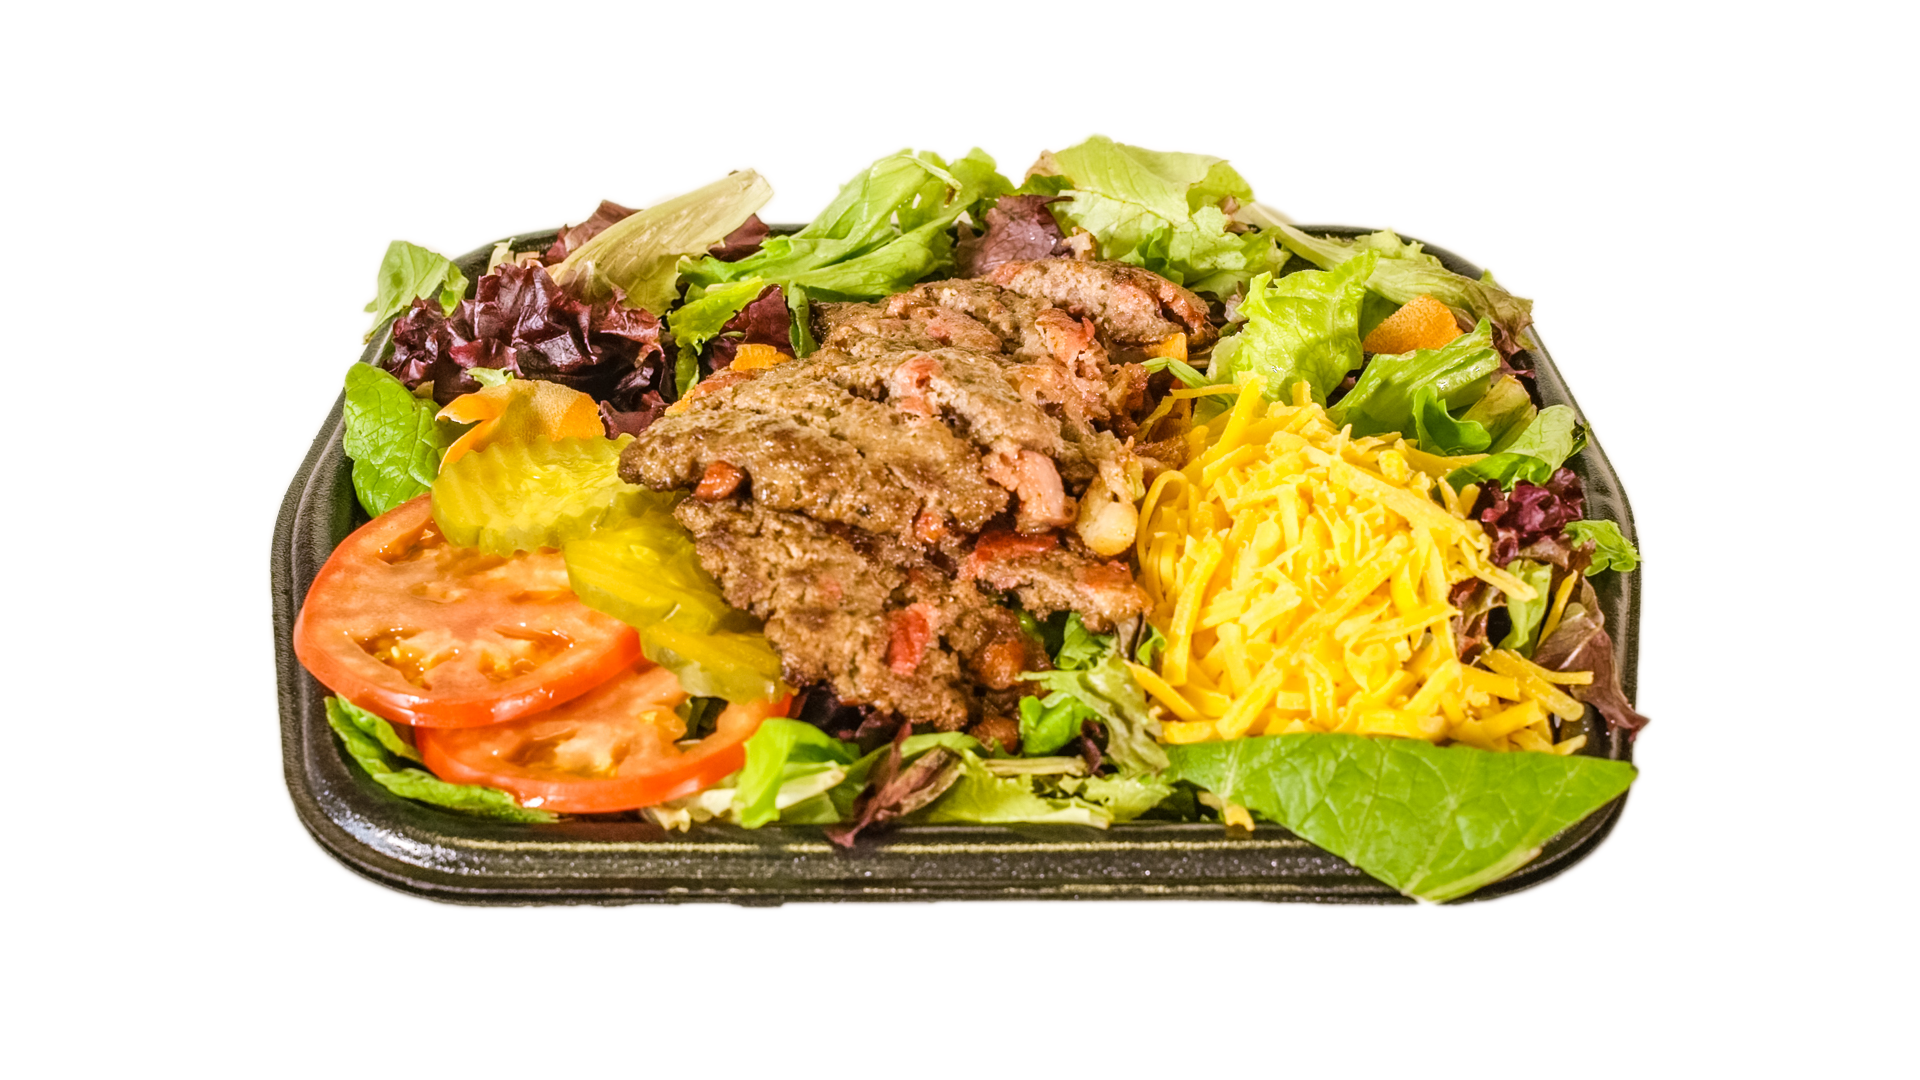 The Station Burger Salad